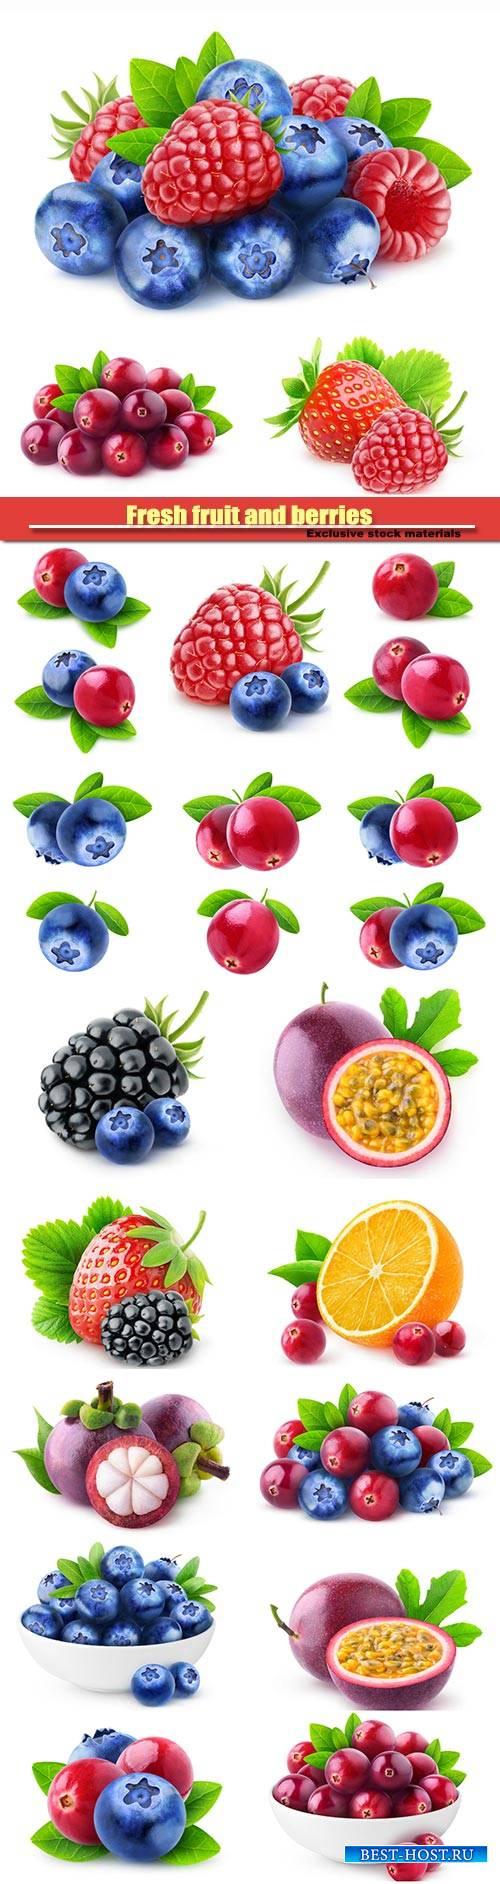 Fresh fruit and berries, blueberries and raspberries